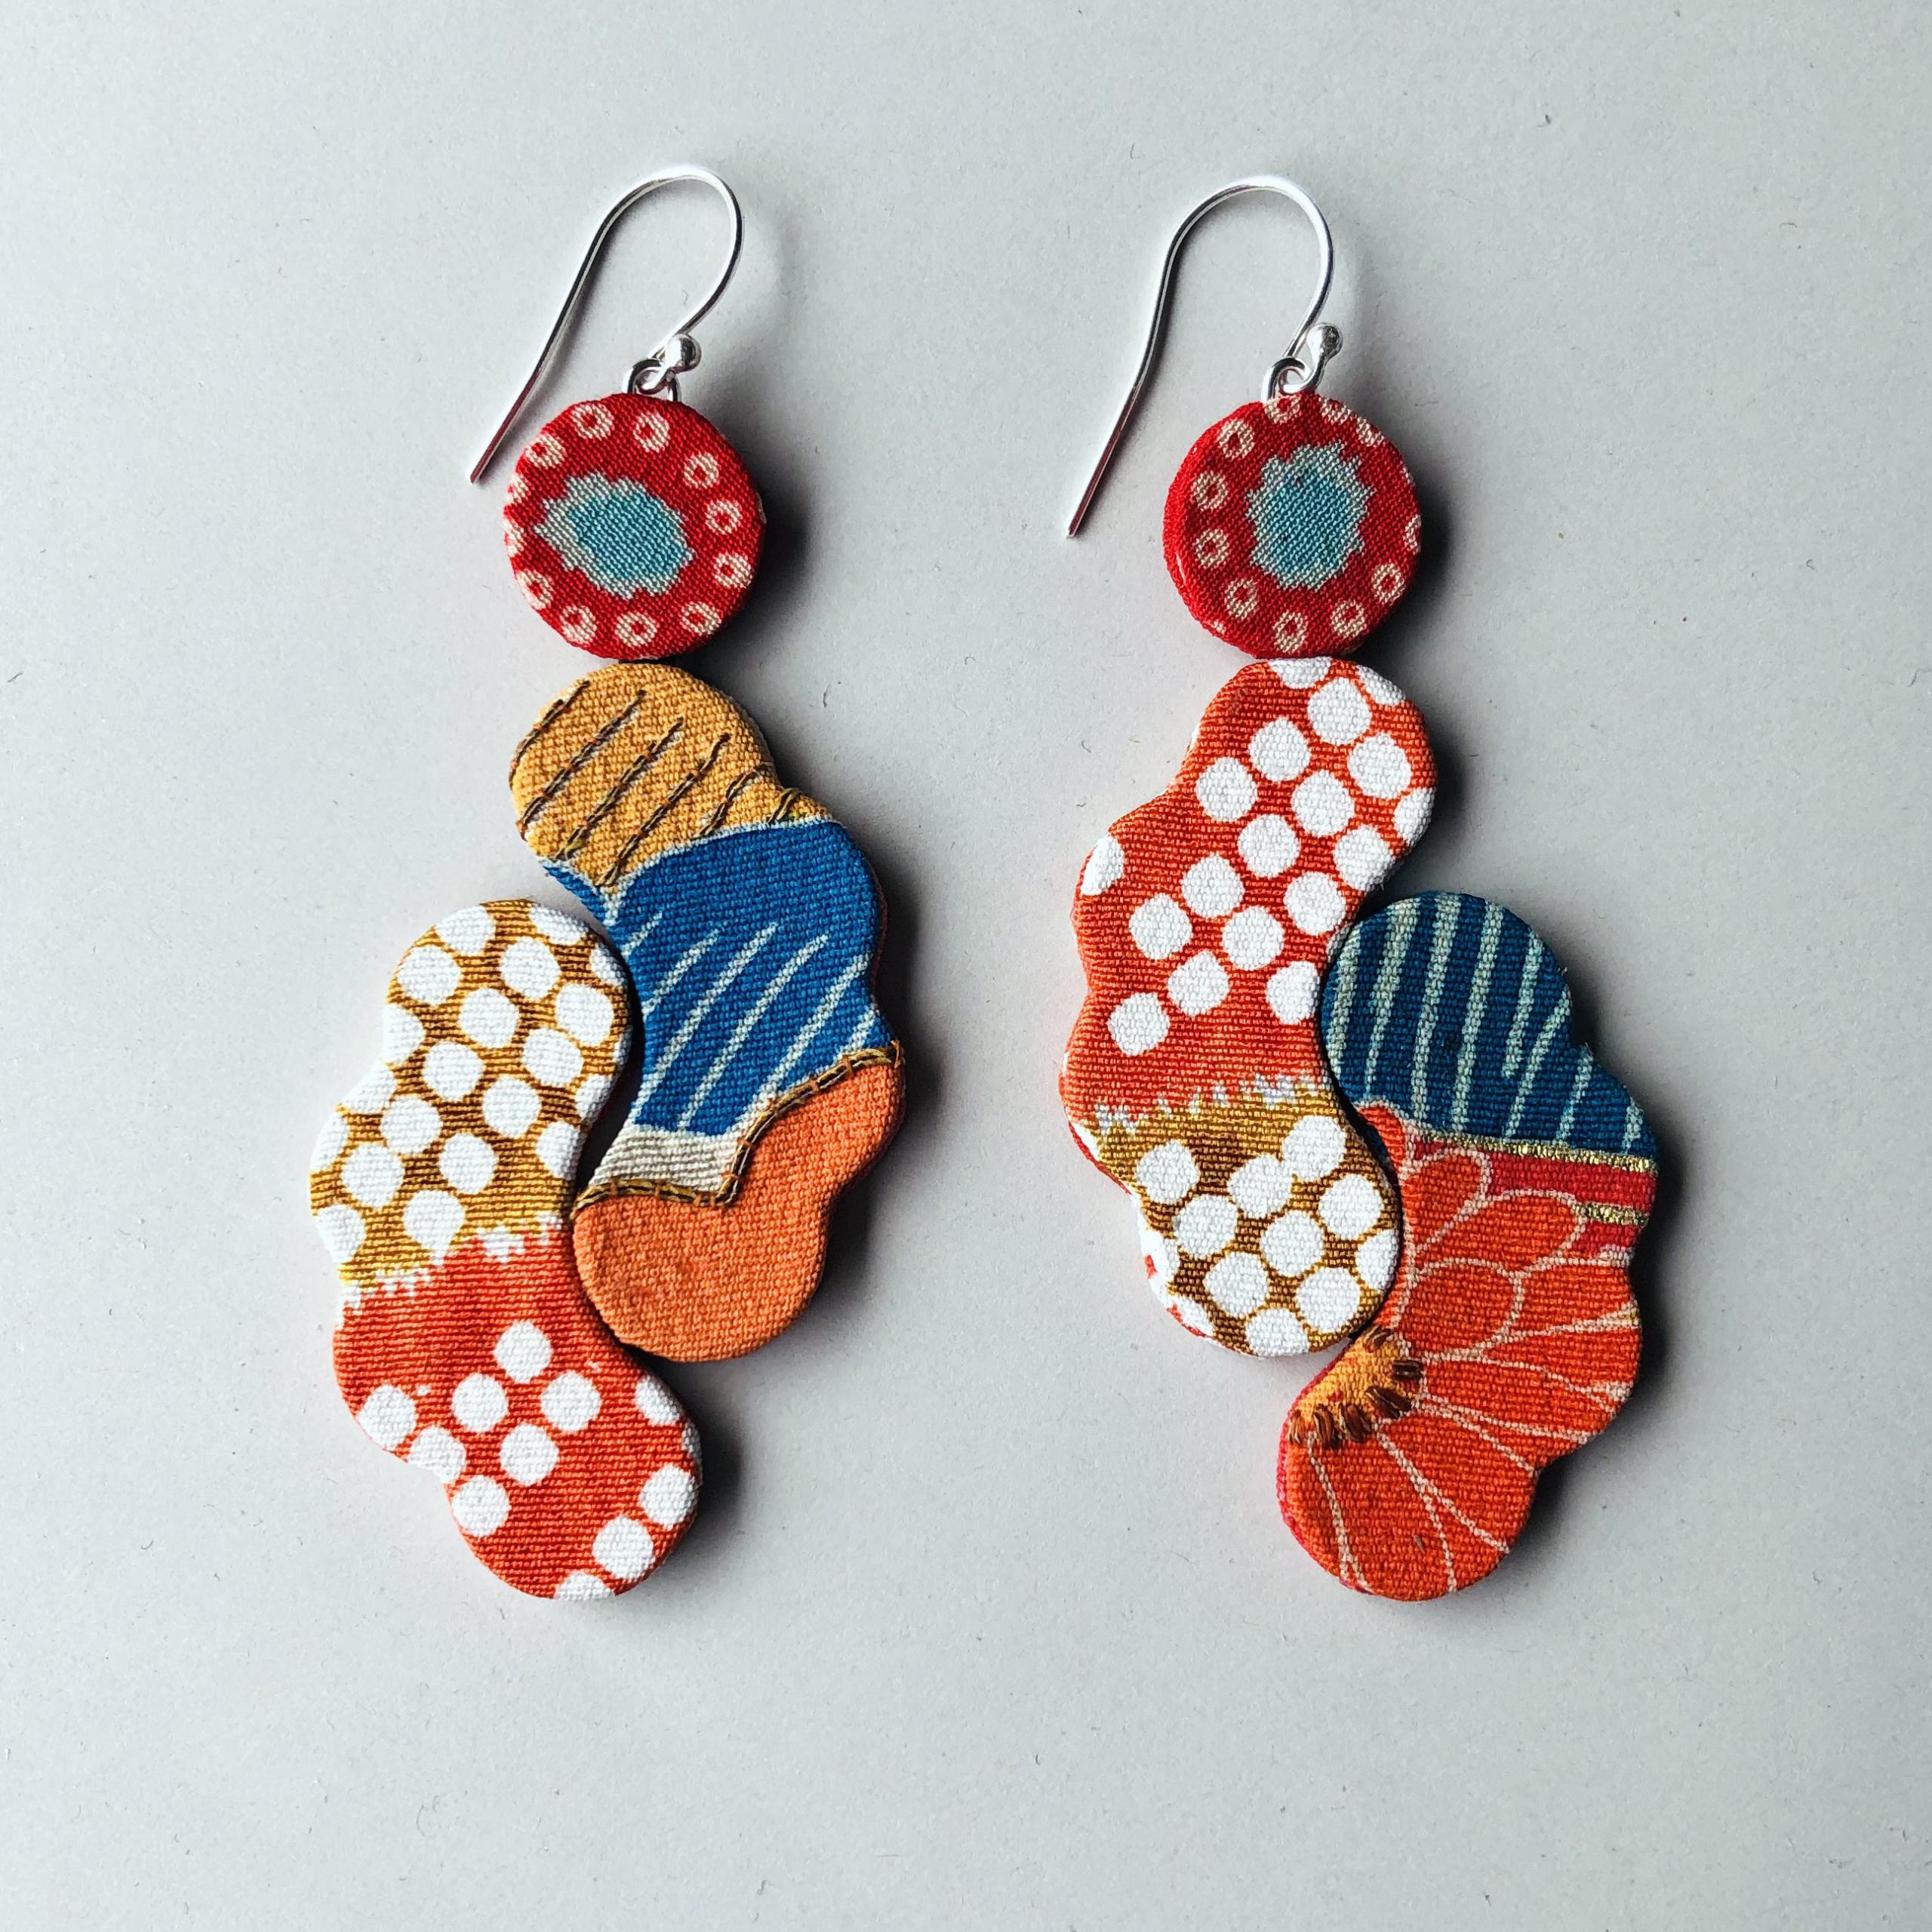 boucles-oreilles-lagon-bijoux-contemporain-galerie-carouge-geneve-galerie-h-valerie-hangel